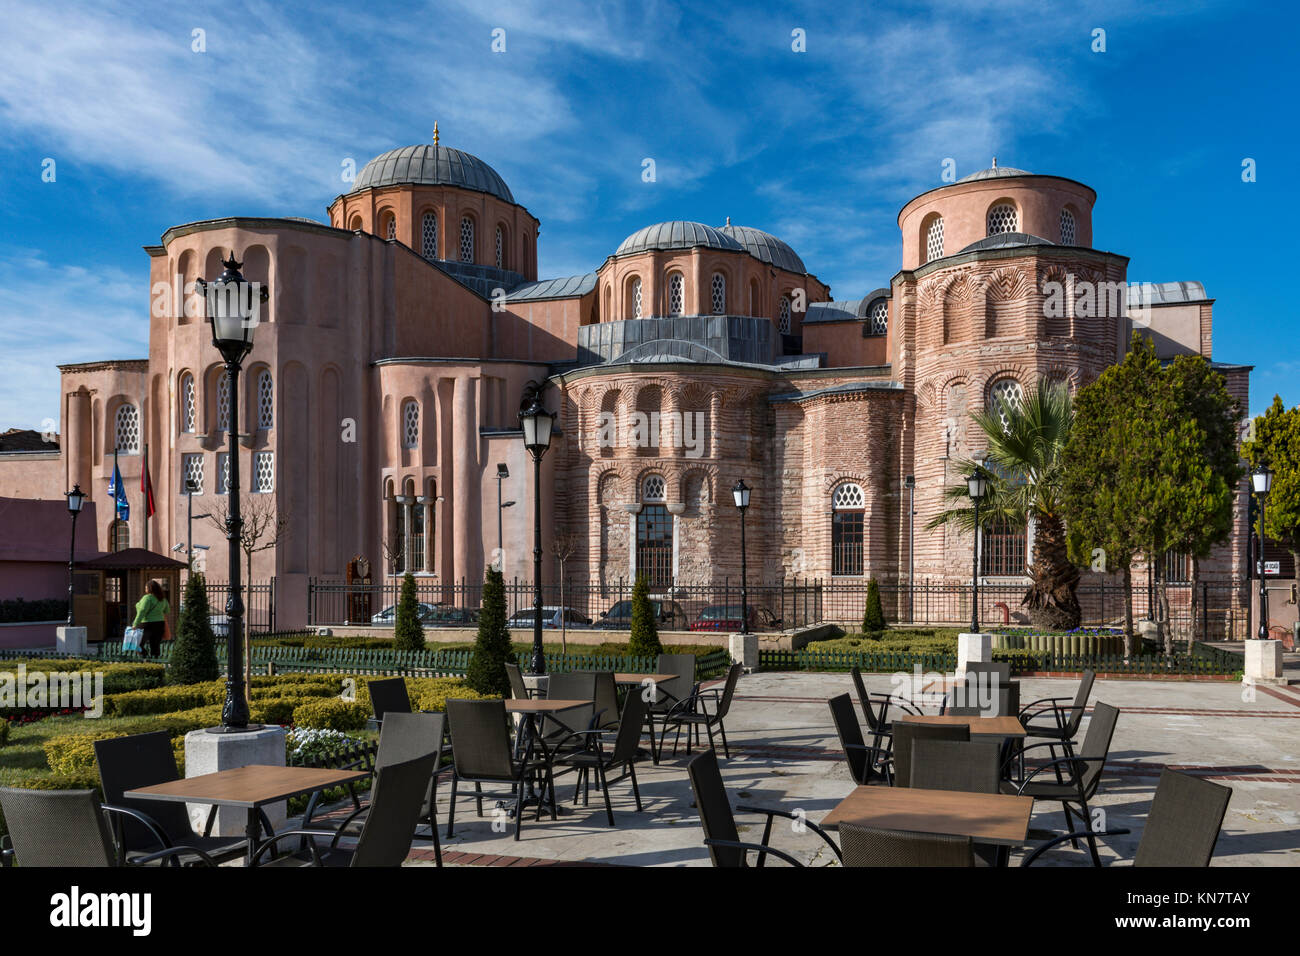 Zeyrek Mosque Pantocrator Istanbul Immagini e Fotos Stock - Alamy